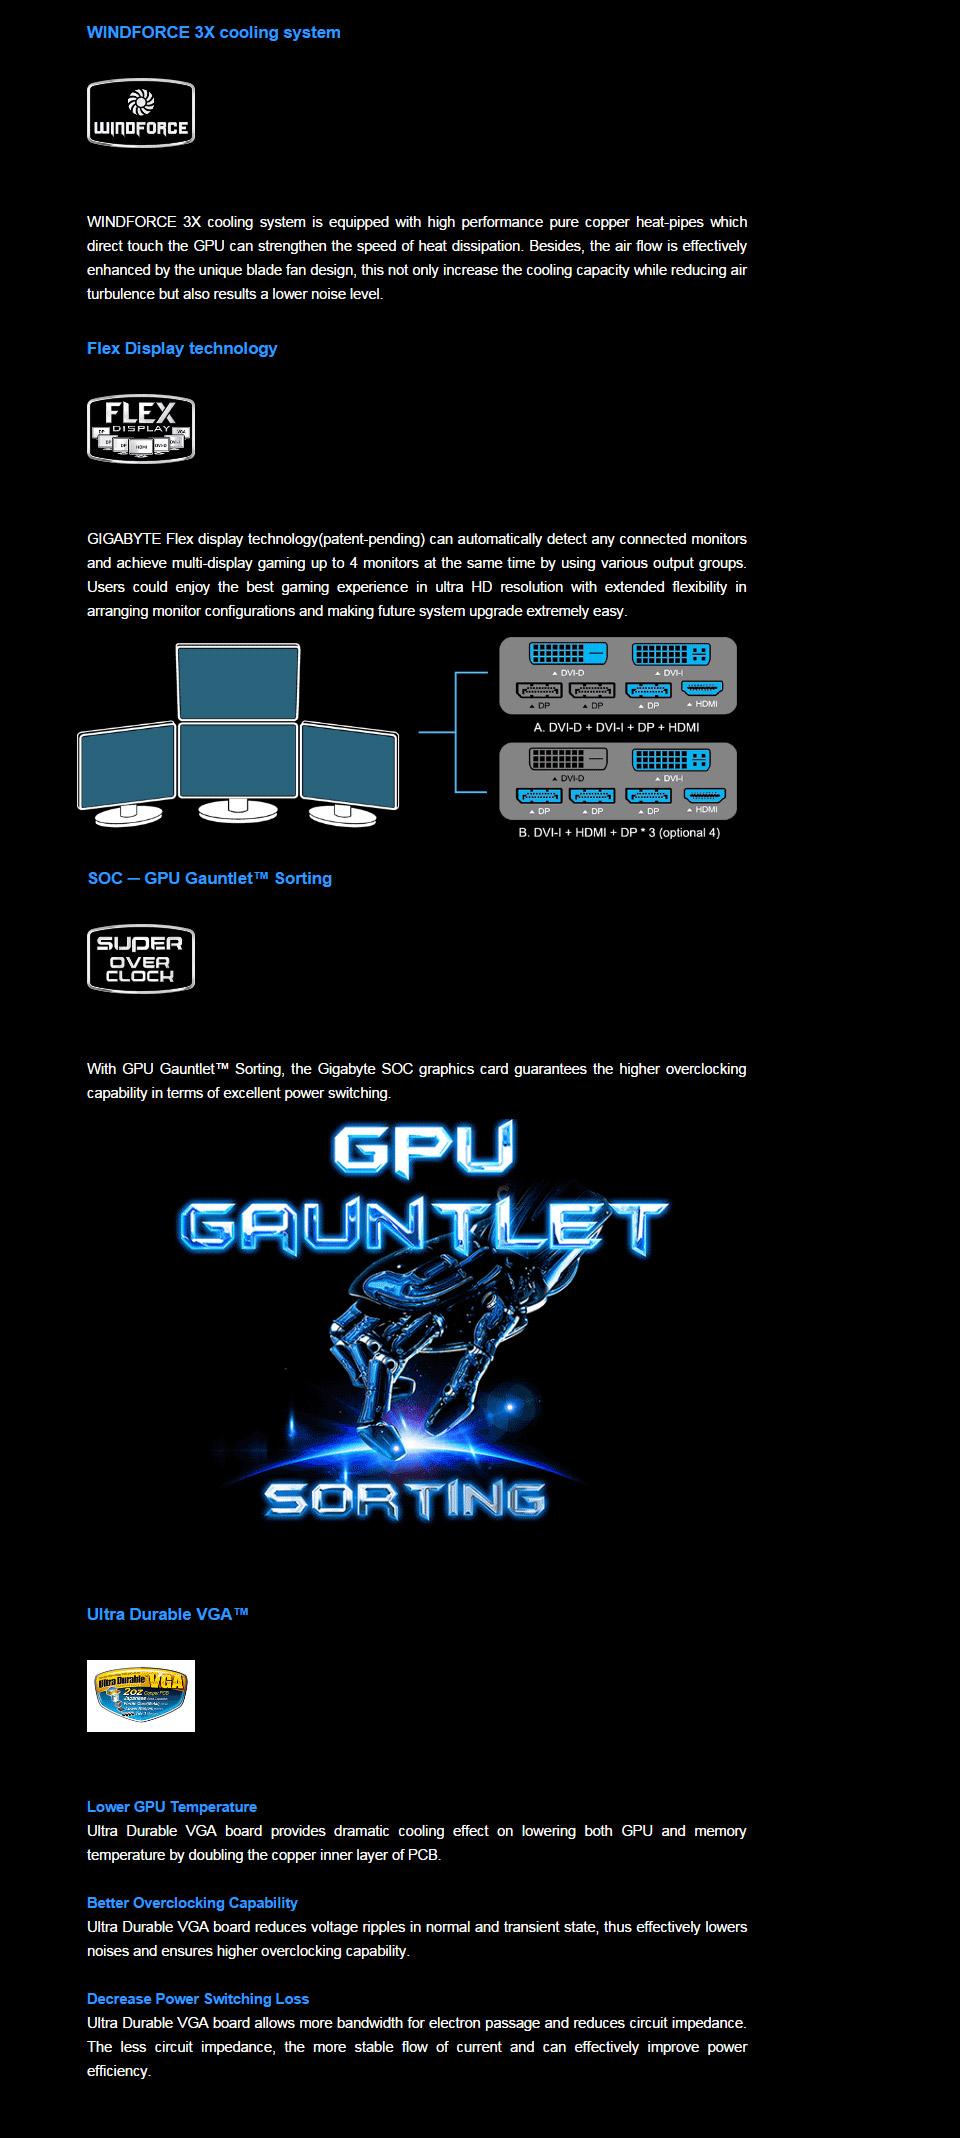 Gigabyte GeForce GTX 970 G1 Gaming 4GB [GV-N970G1-GAMING-4GD